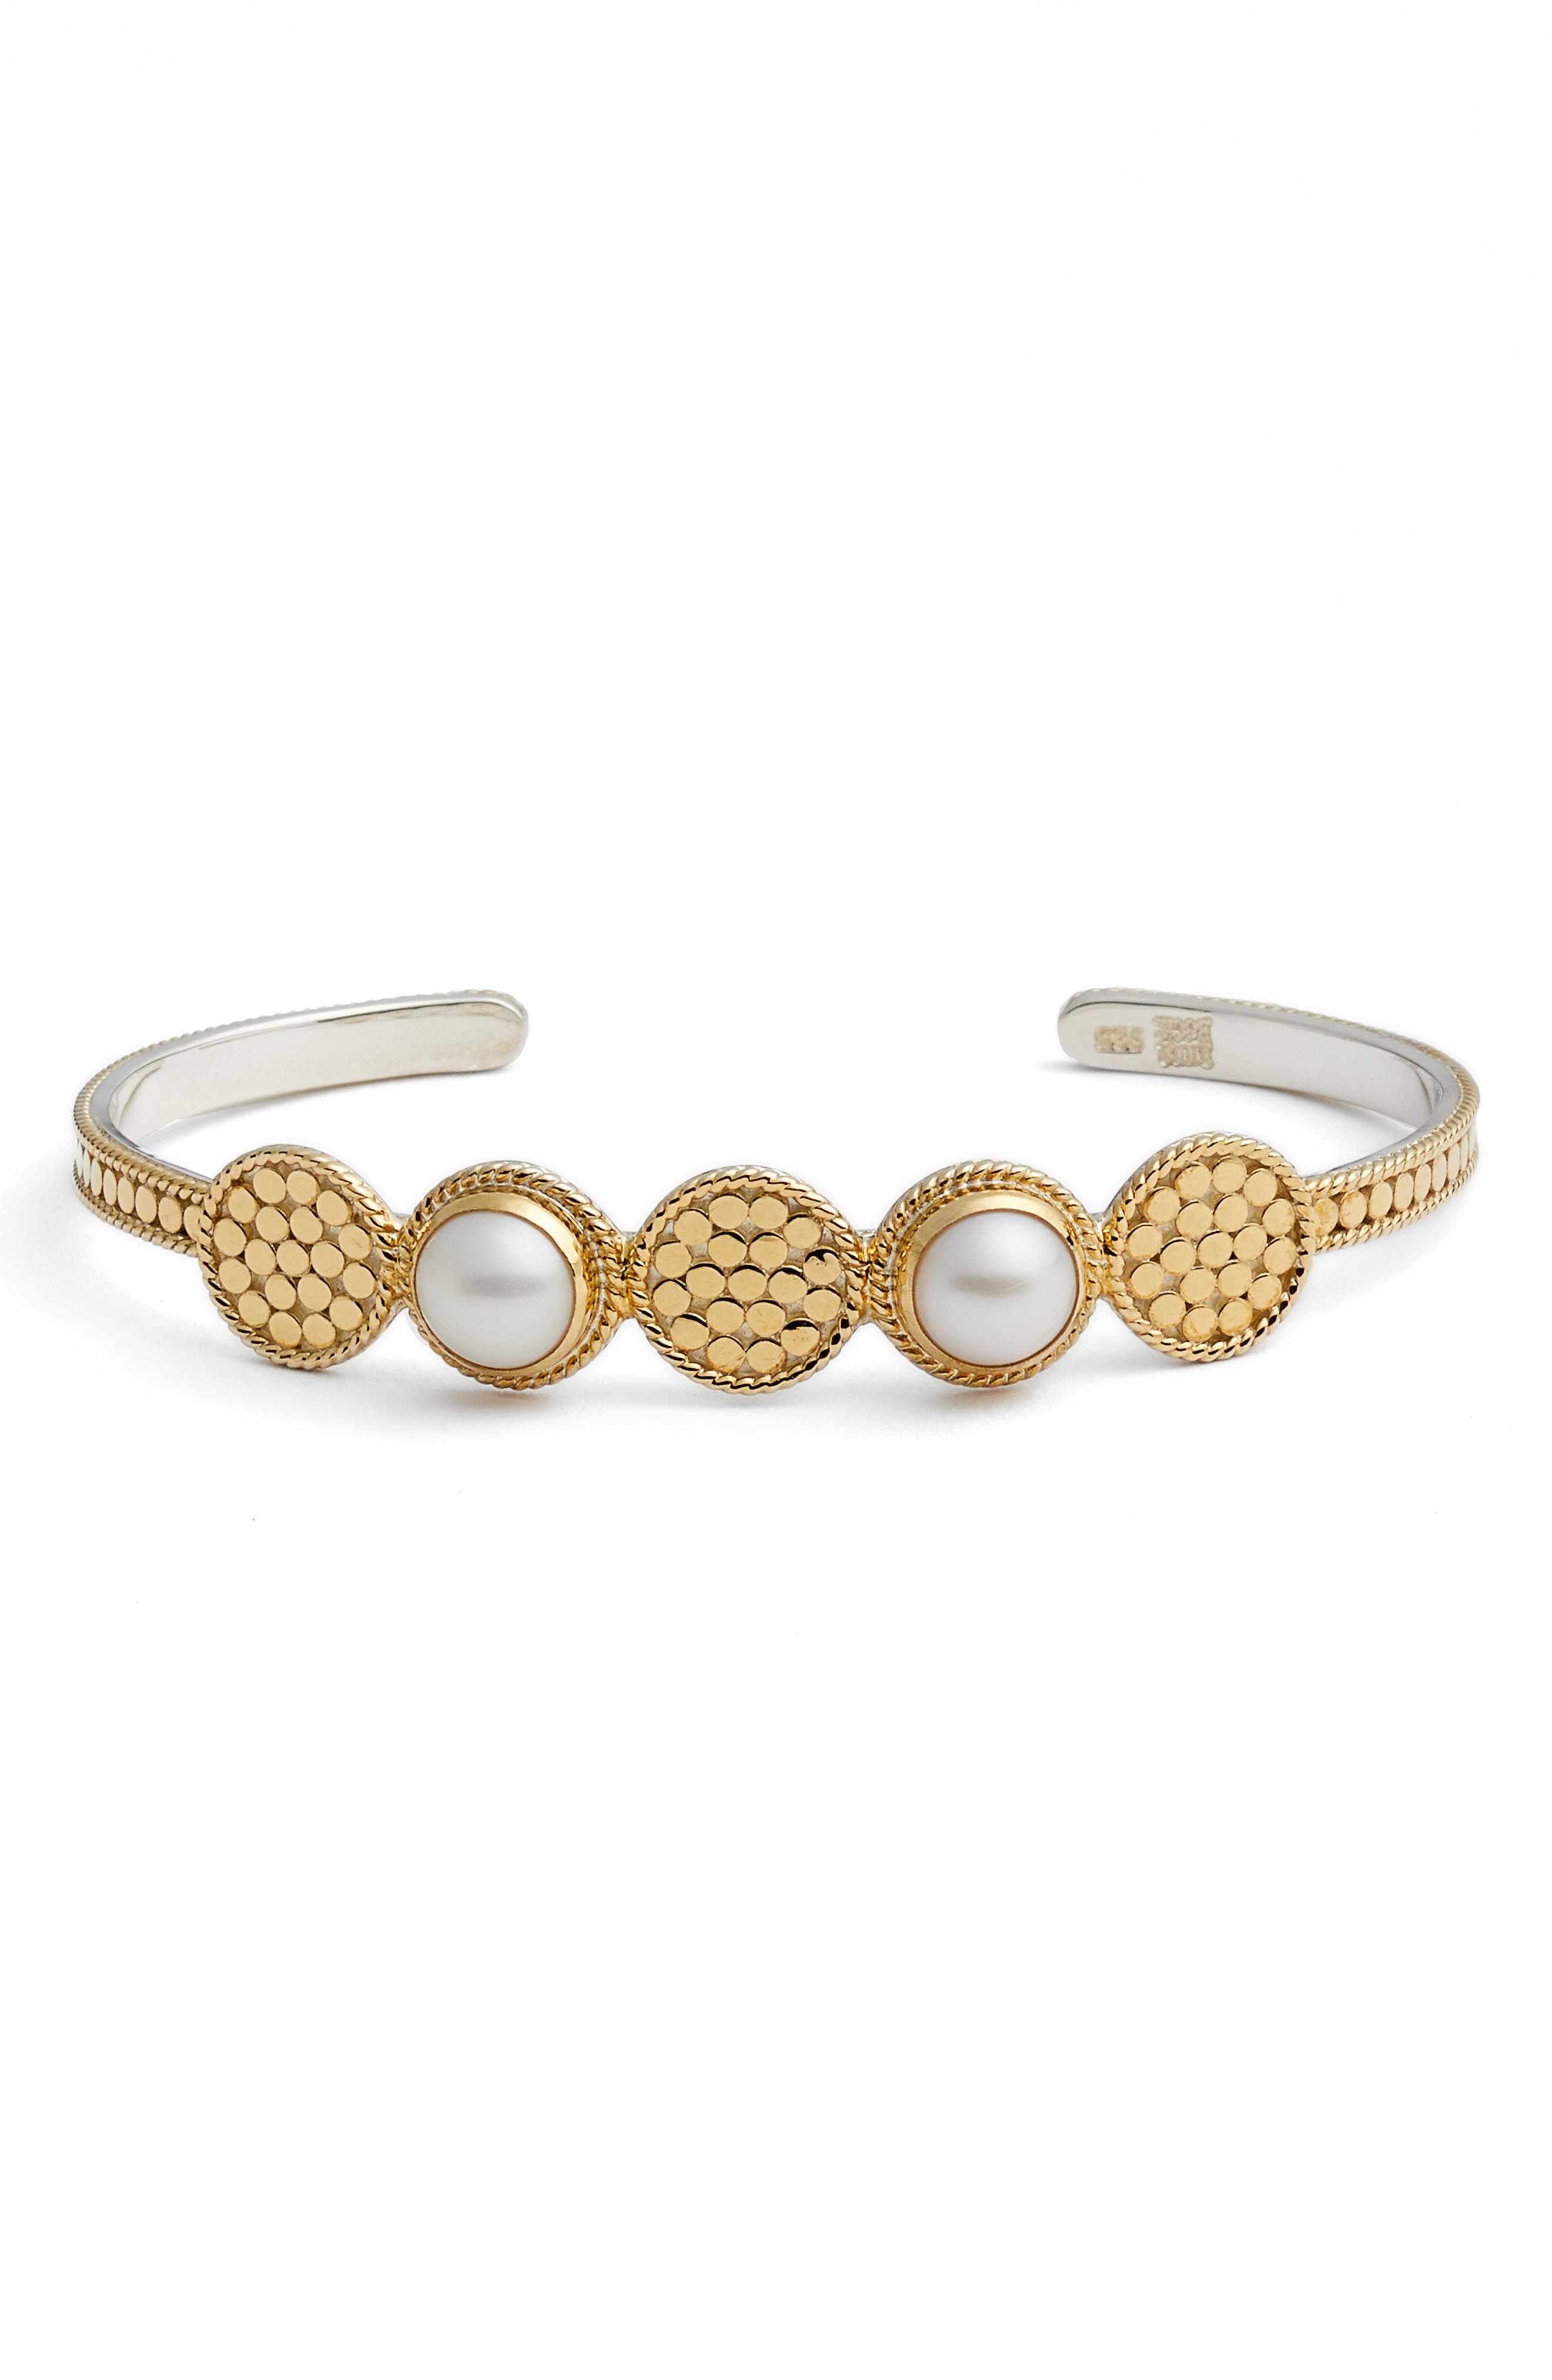 Pearl Multidisc Cuff Bracelet,                             Main thumbnail 1, color,                             GOLD/ PEARL